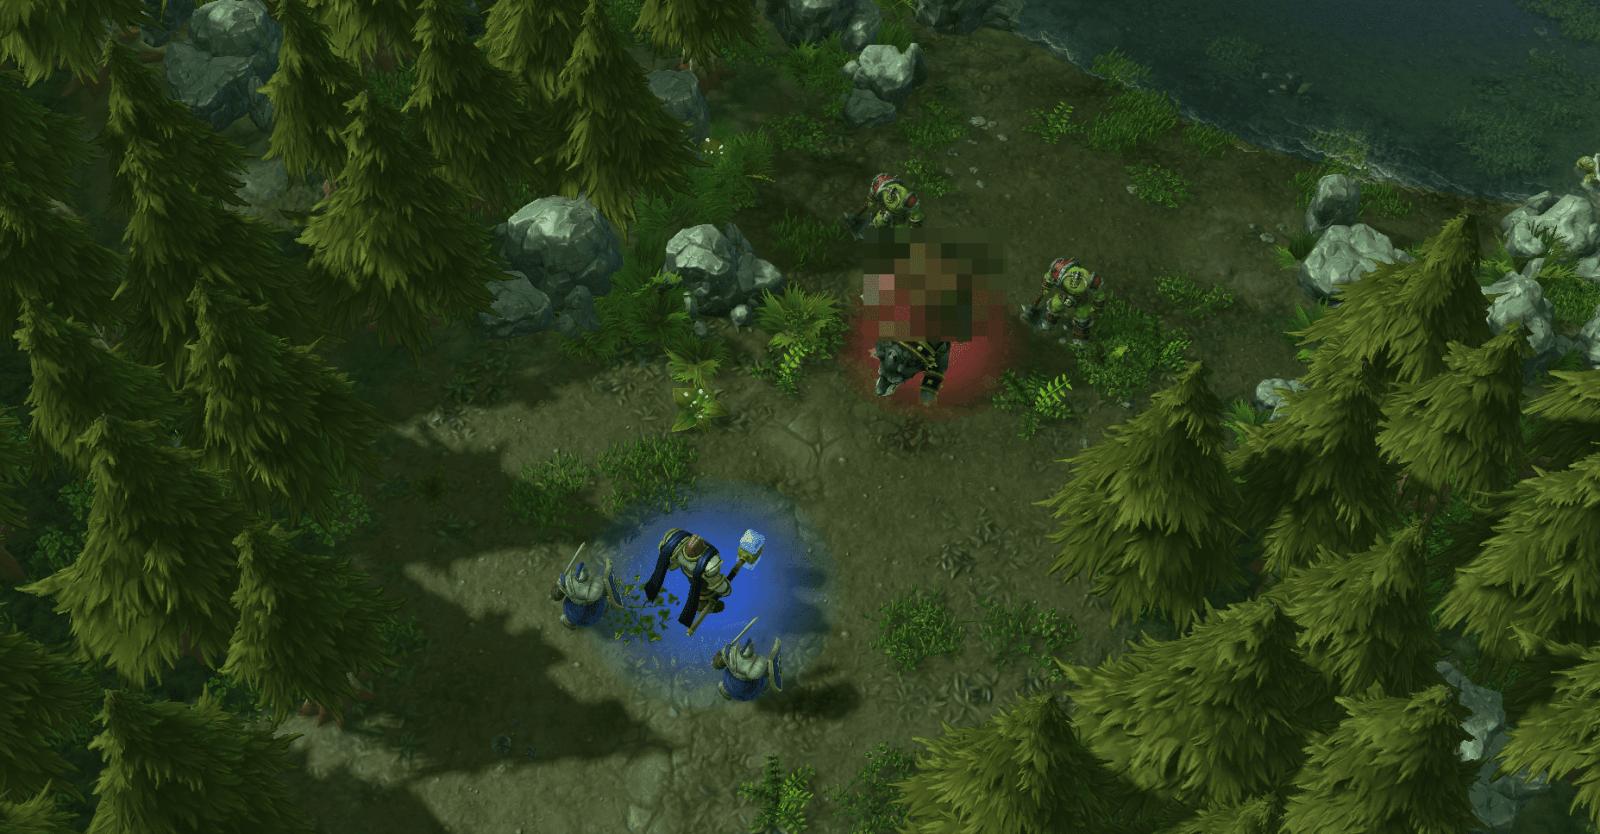 Blizzard разрабатывают мобильную онлайн-стратегию (NakedThrall)